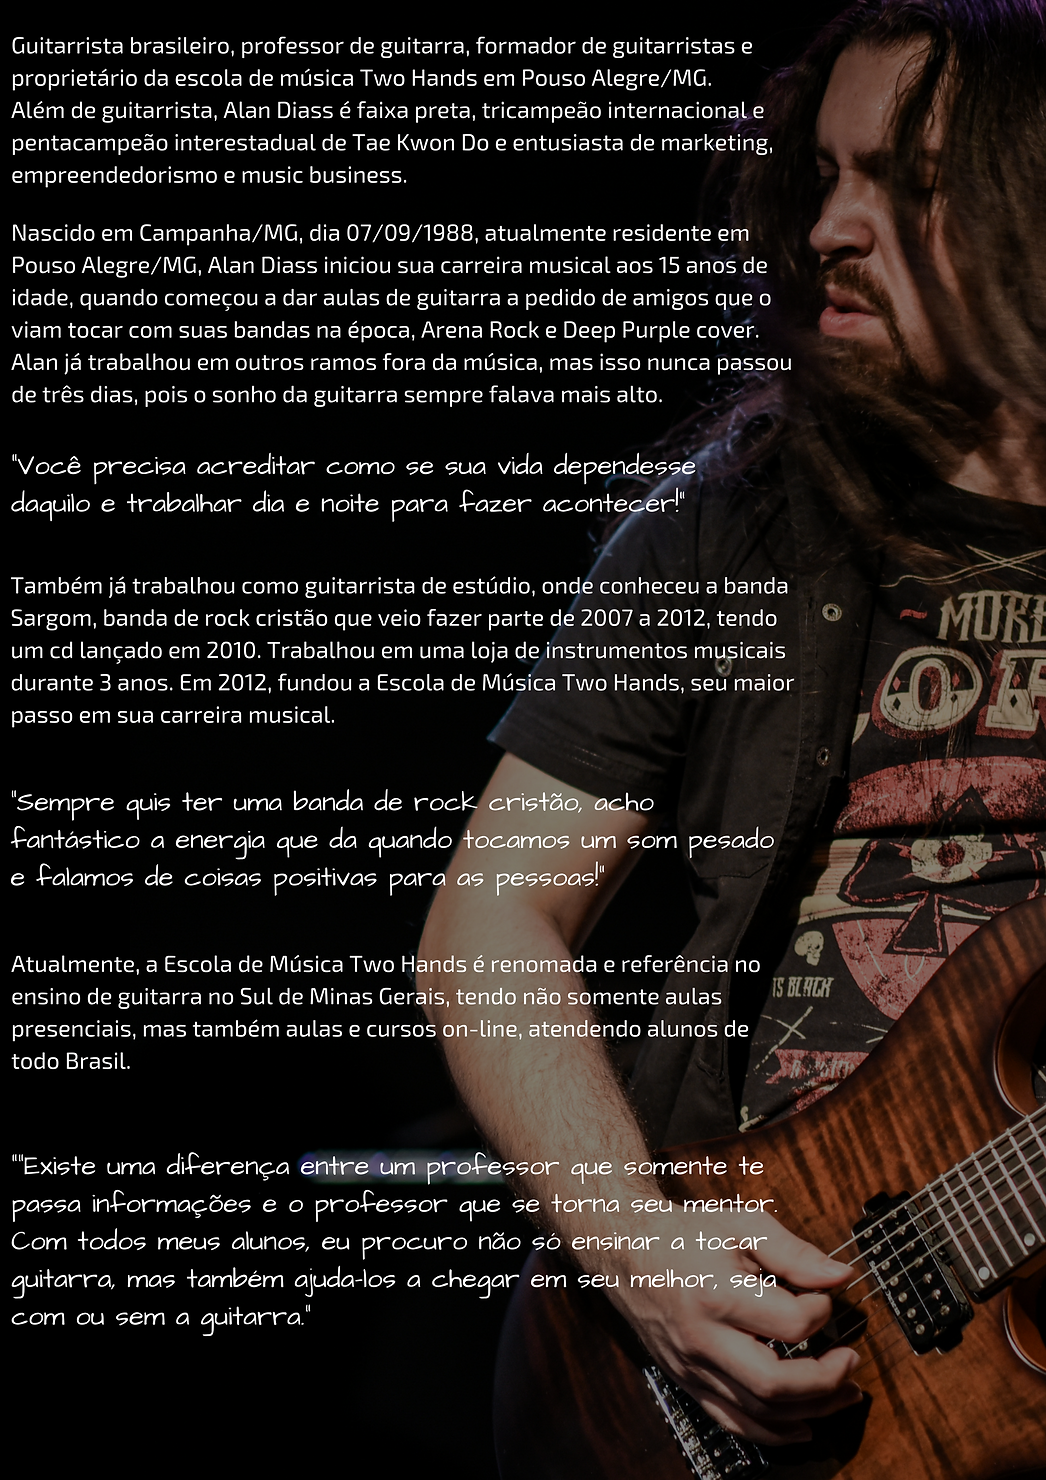 Adicionar_Guitarrista_brasileiro,_profes